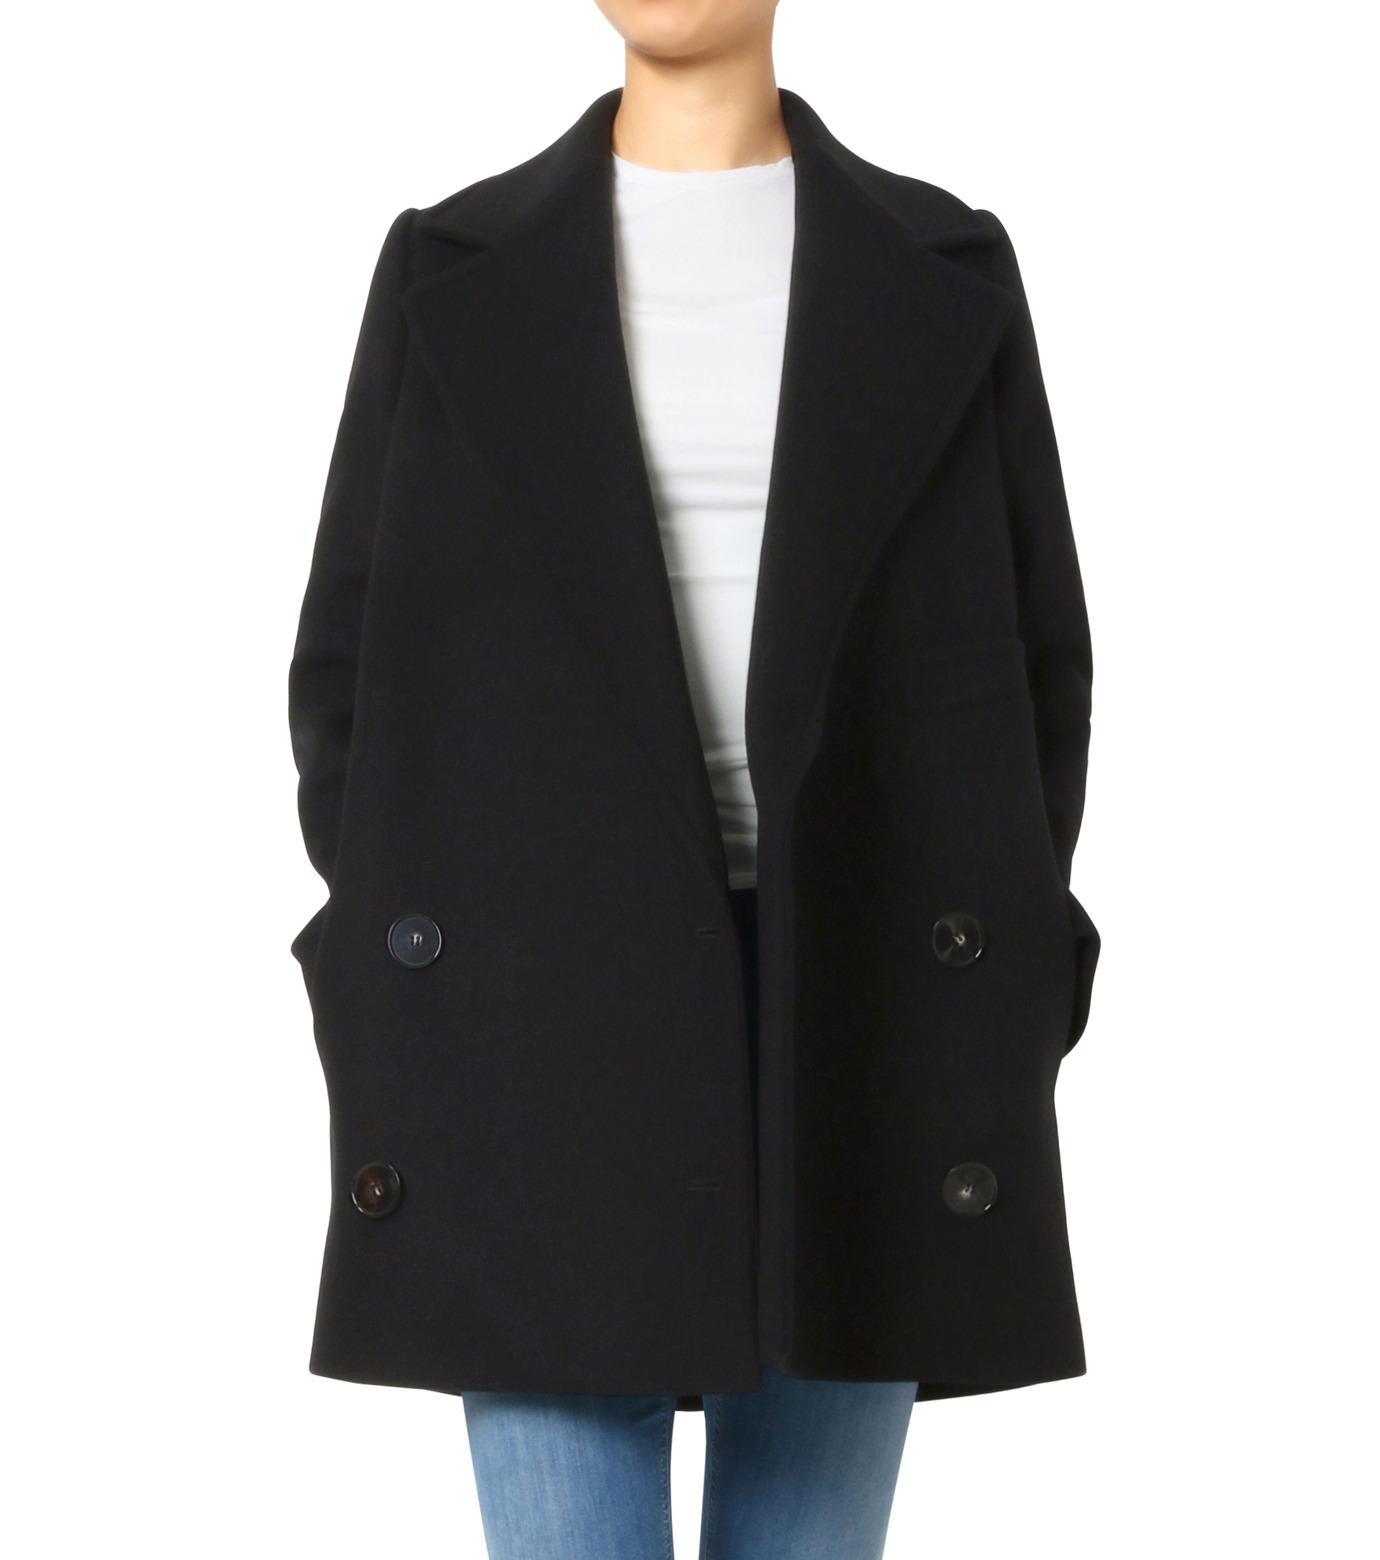 Stella McCartney(ステラマッカートニー)のWool Melton Short Coat-BLACK(コート/coat)-393143-SDB40-13 拡大詳細画像1